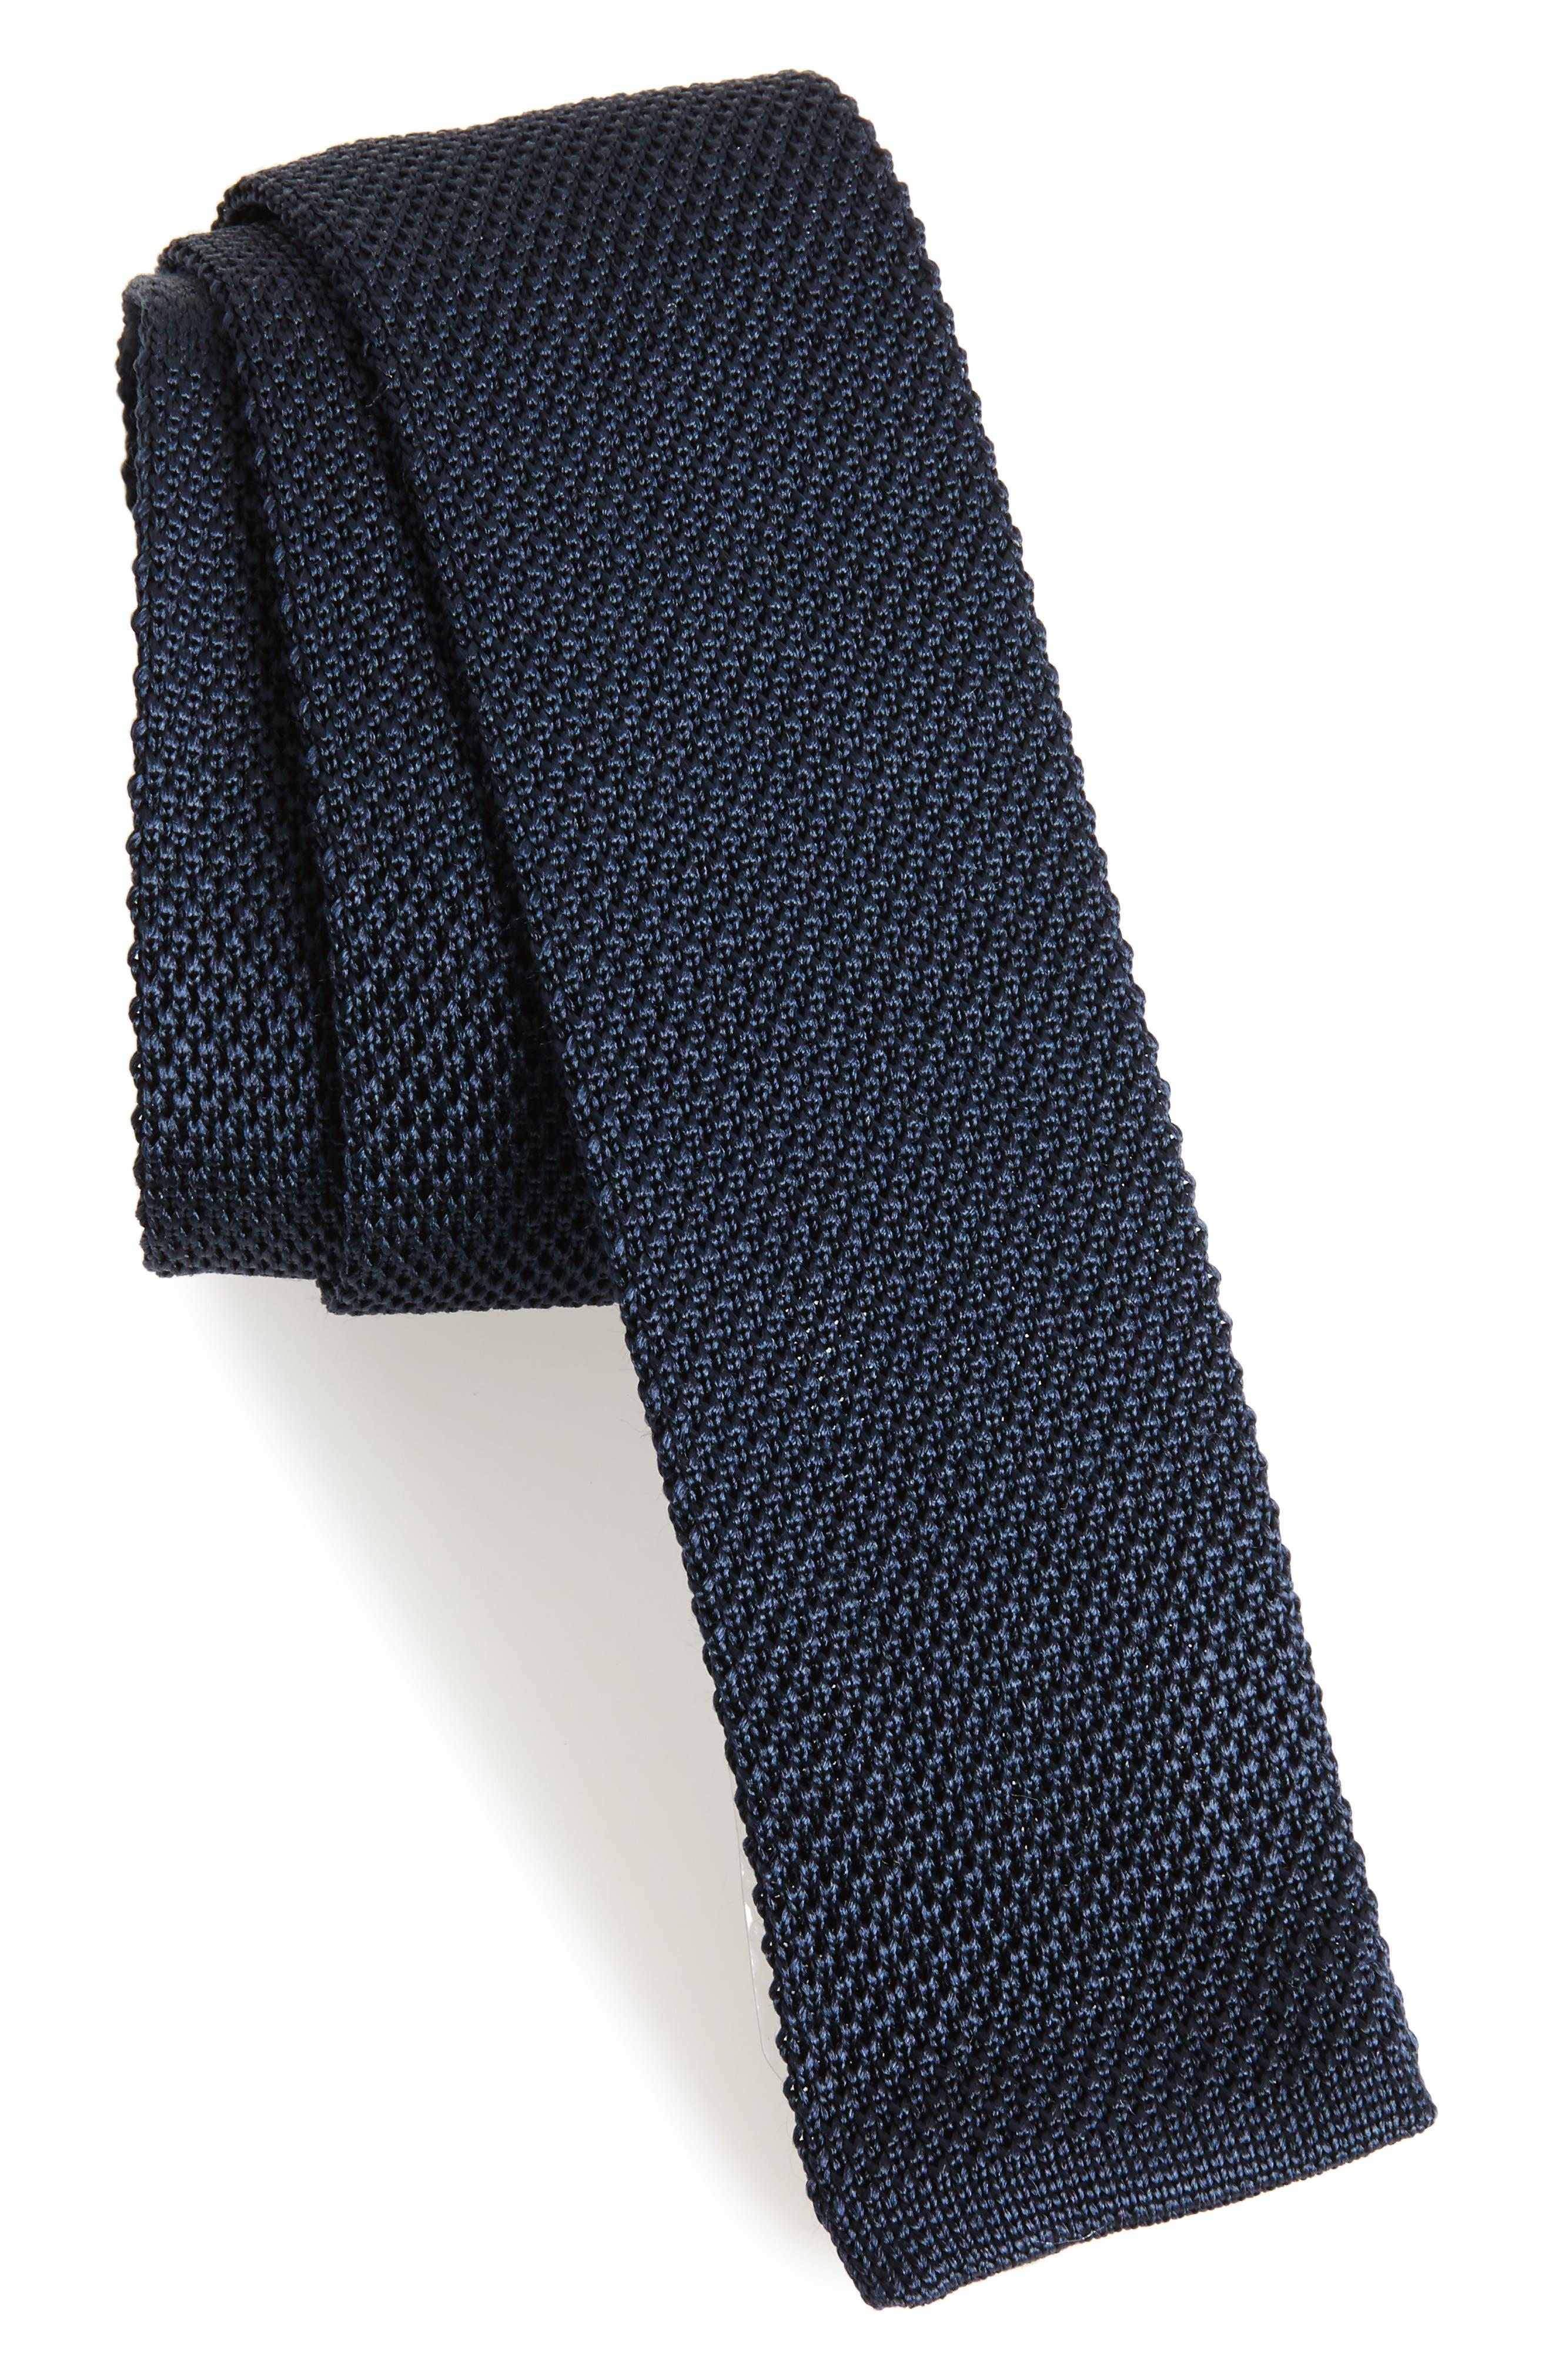 Main Image - Eleventy Solid Knit Silk Tie